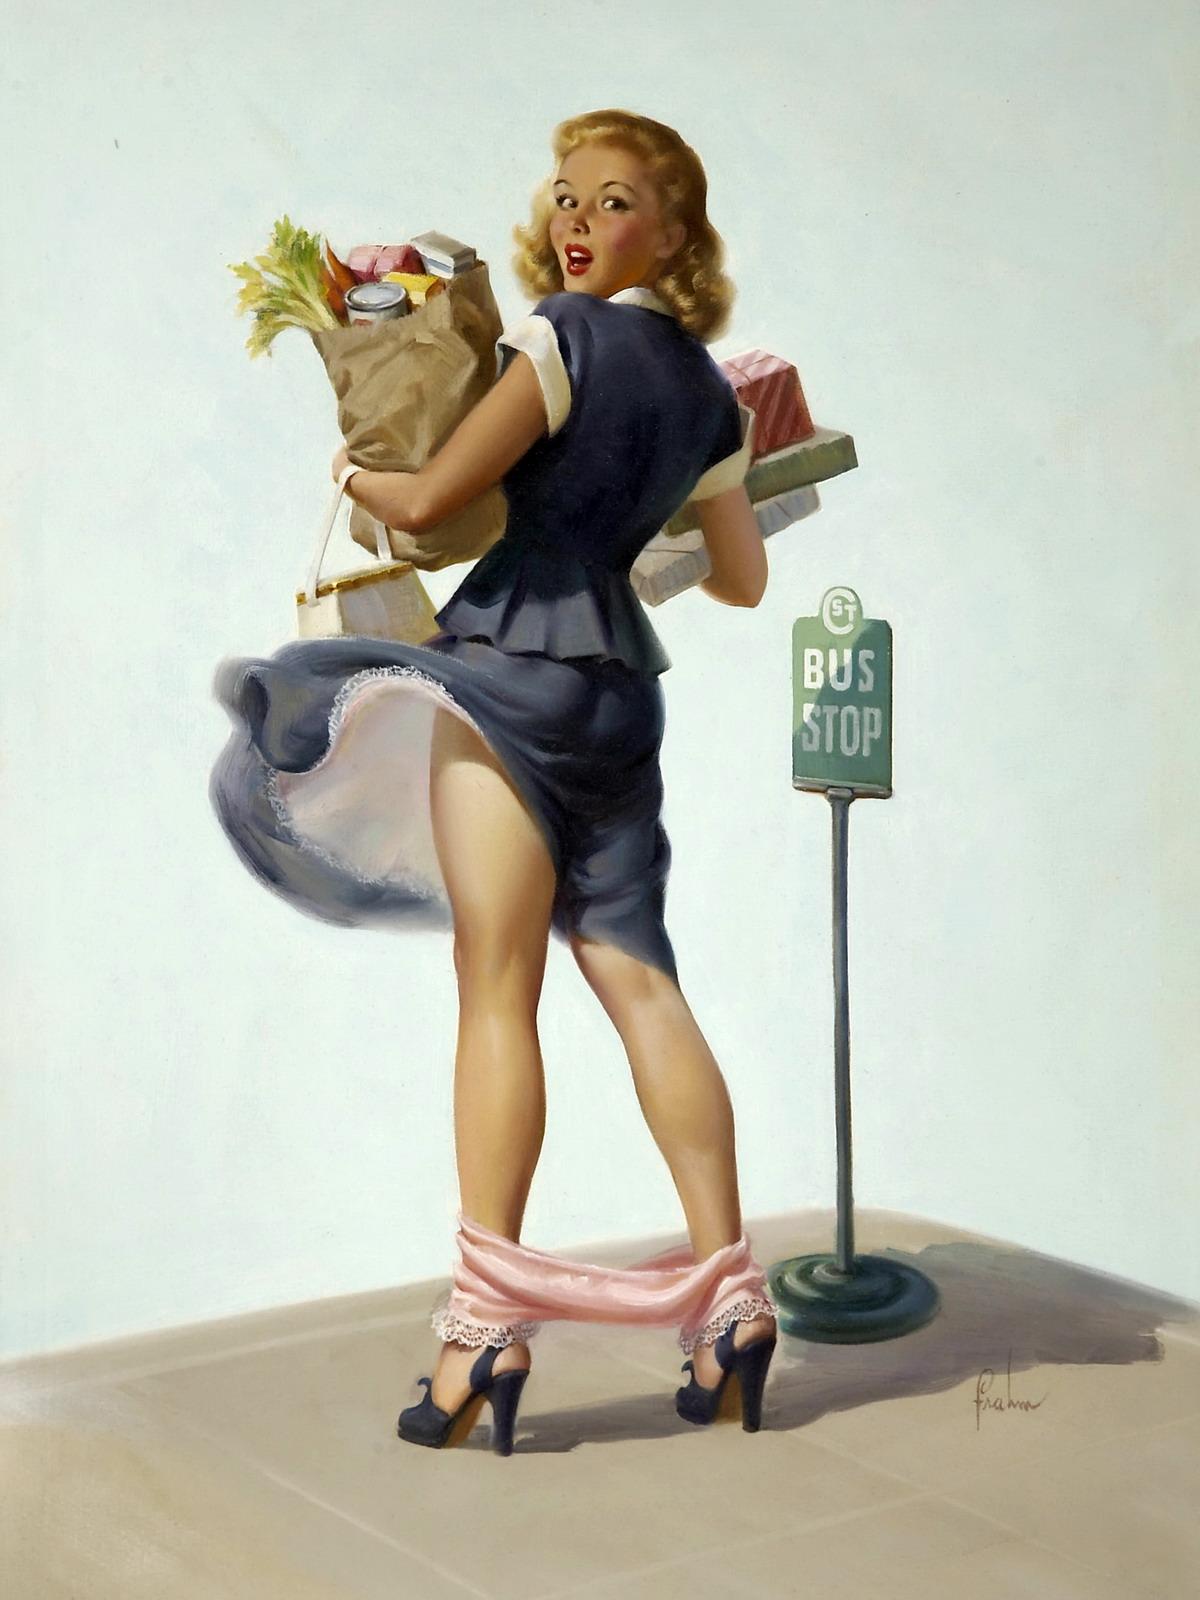 Daphne maxwell reid naked